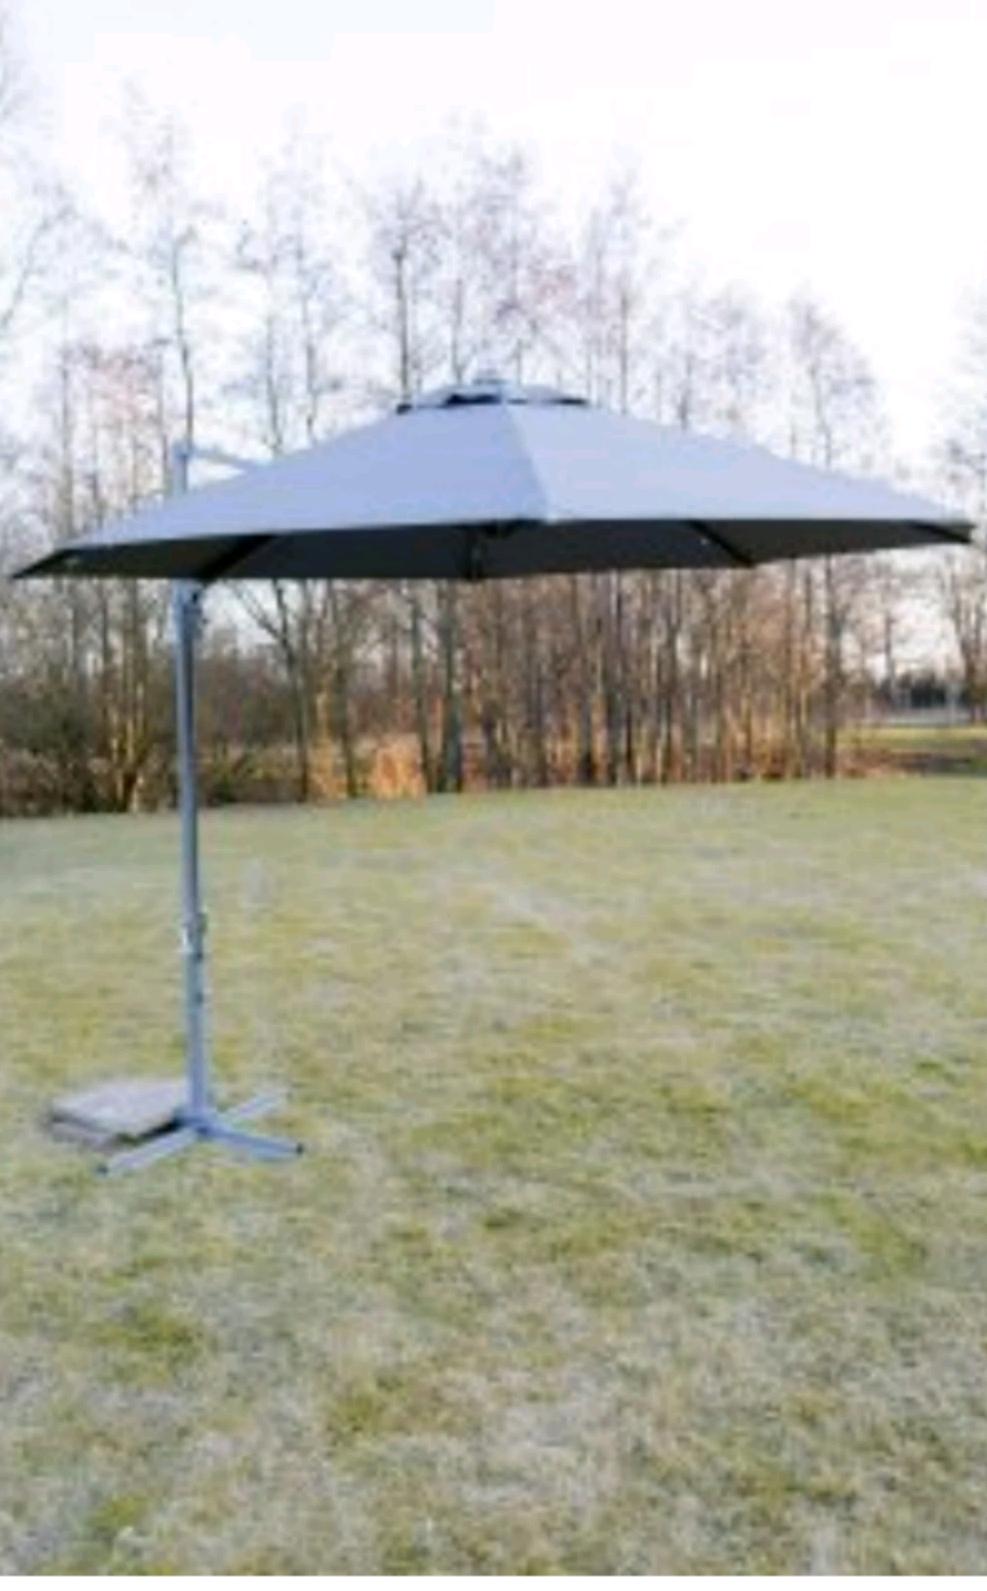 Amazon Ampel/Sonnenschirm Luna Rite Season, 3 m inklusive LED Lichter, 360 Grad drehbar